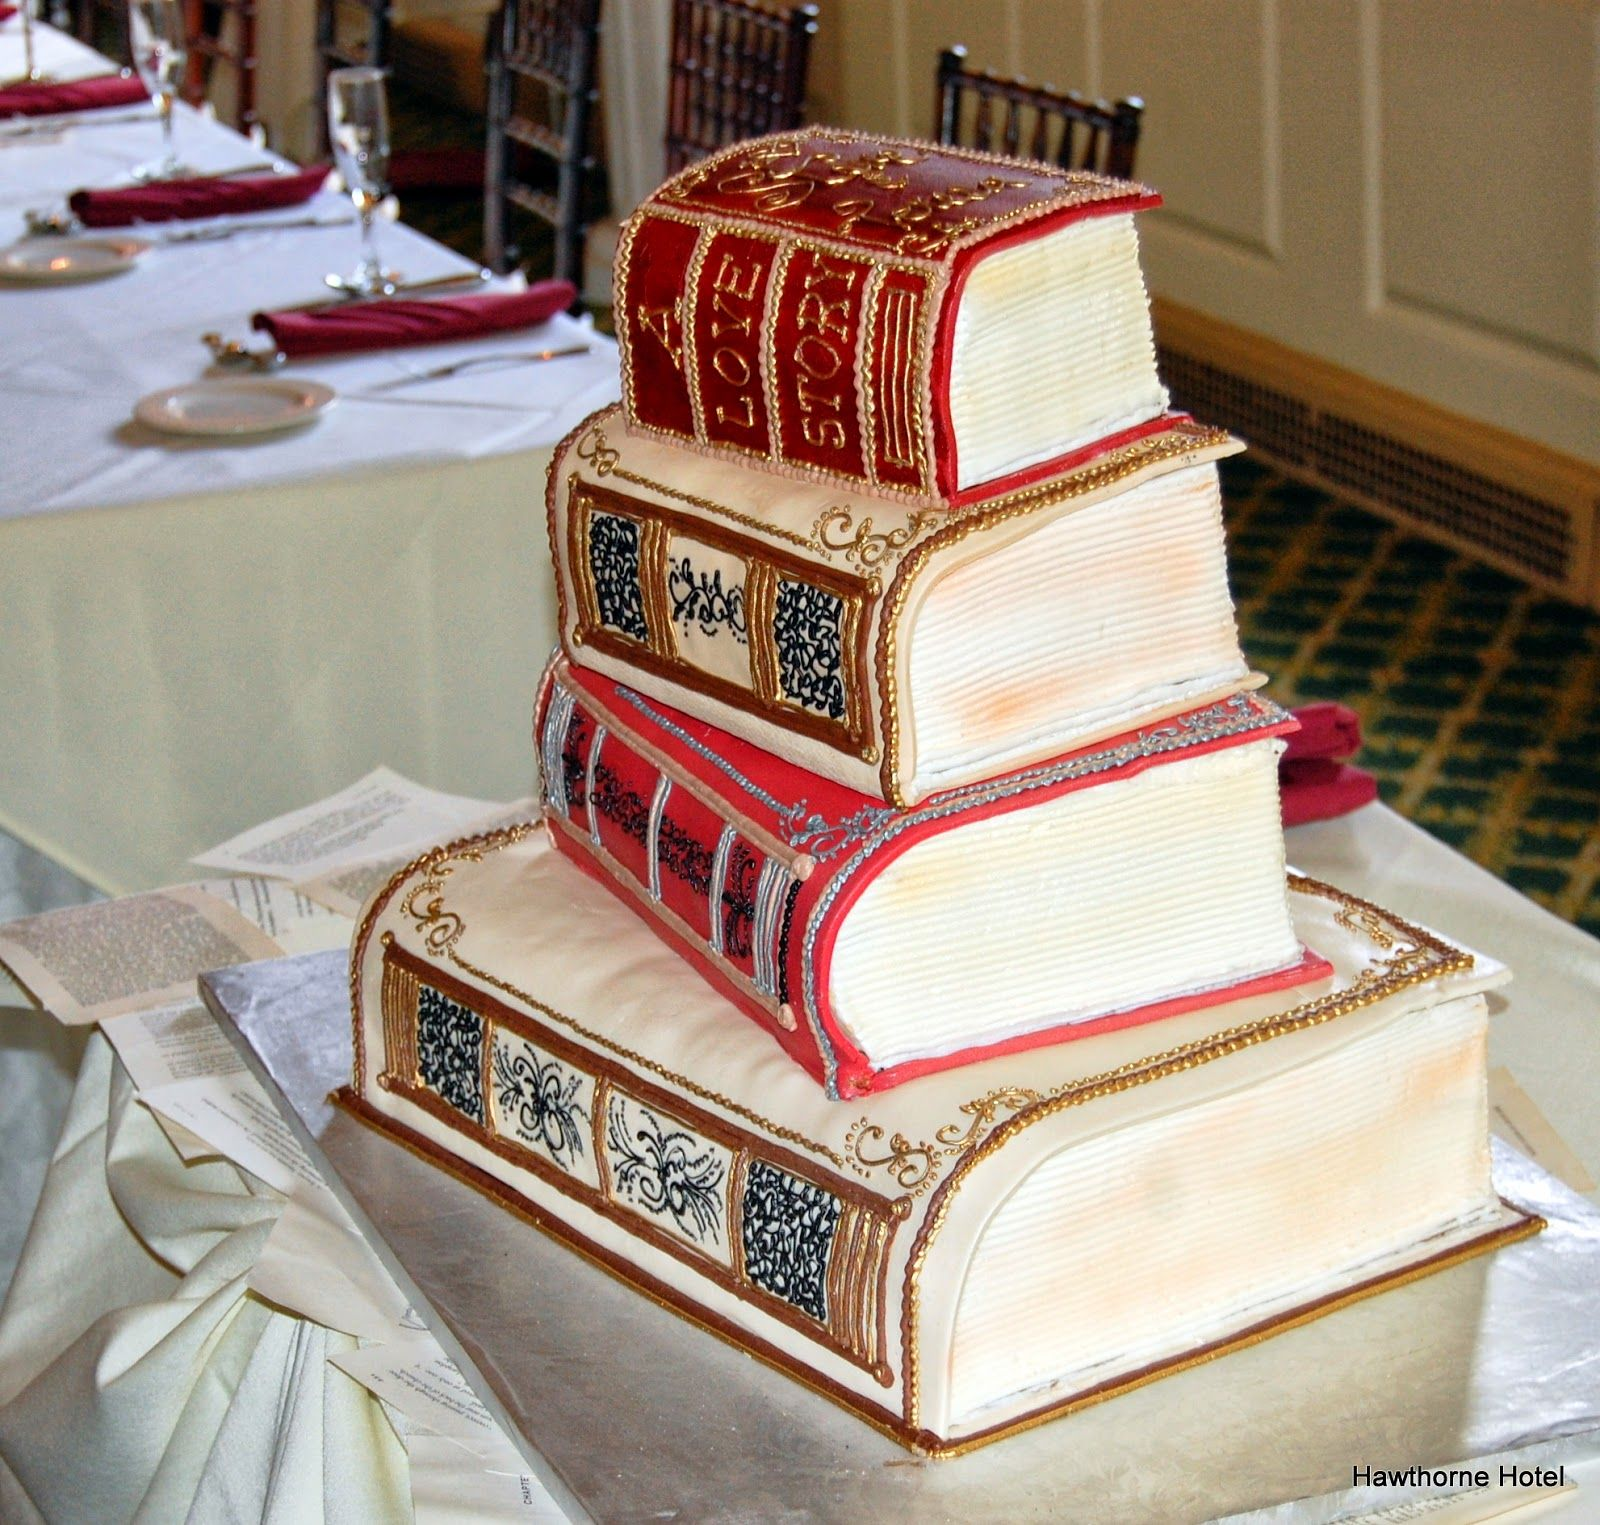 Weddings at the Hawthorne Hotel LiteraryBook Themed Wedding